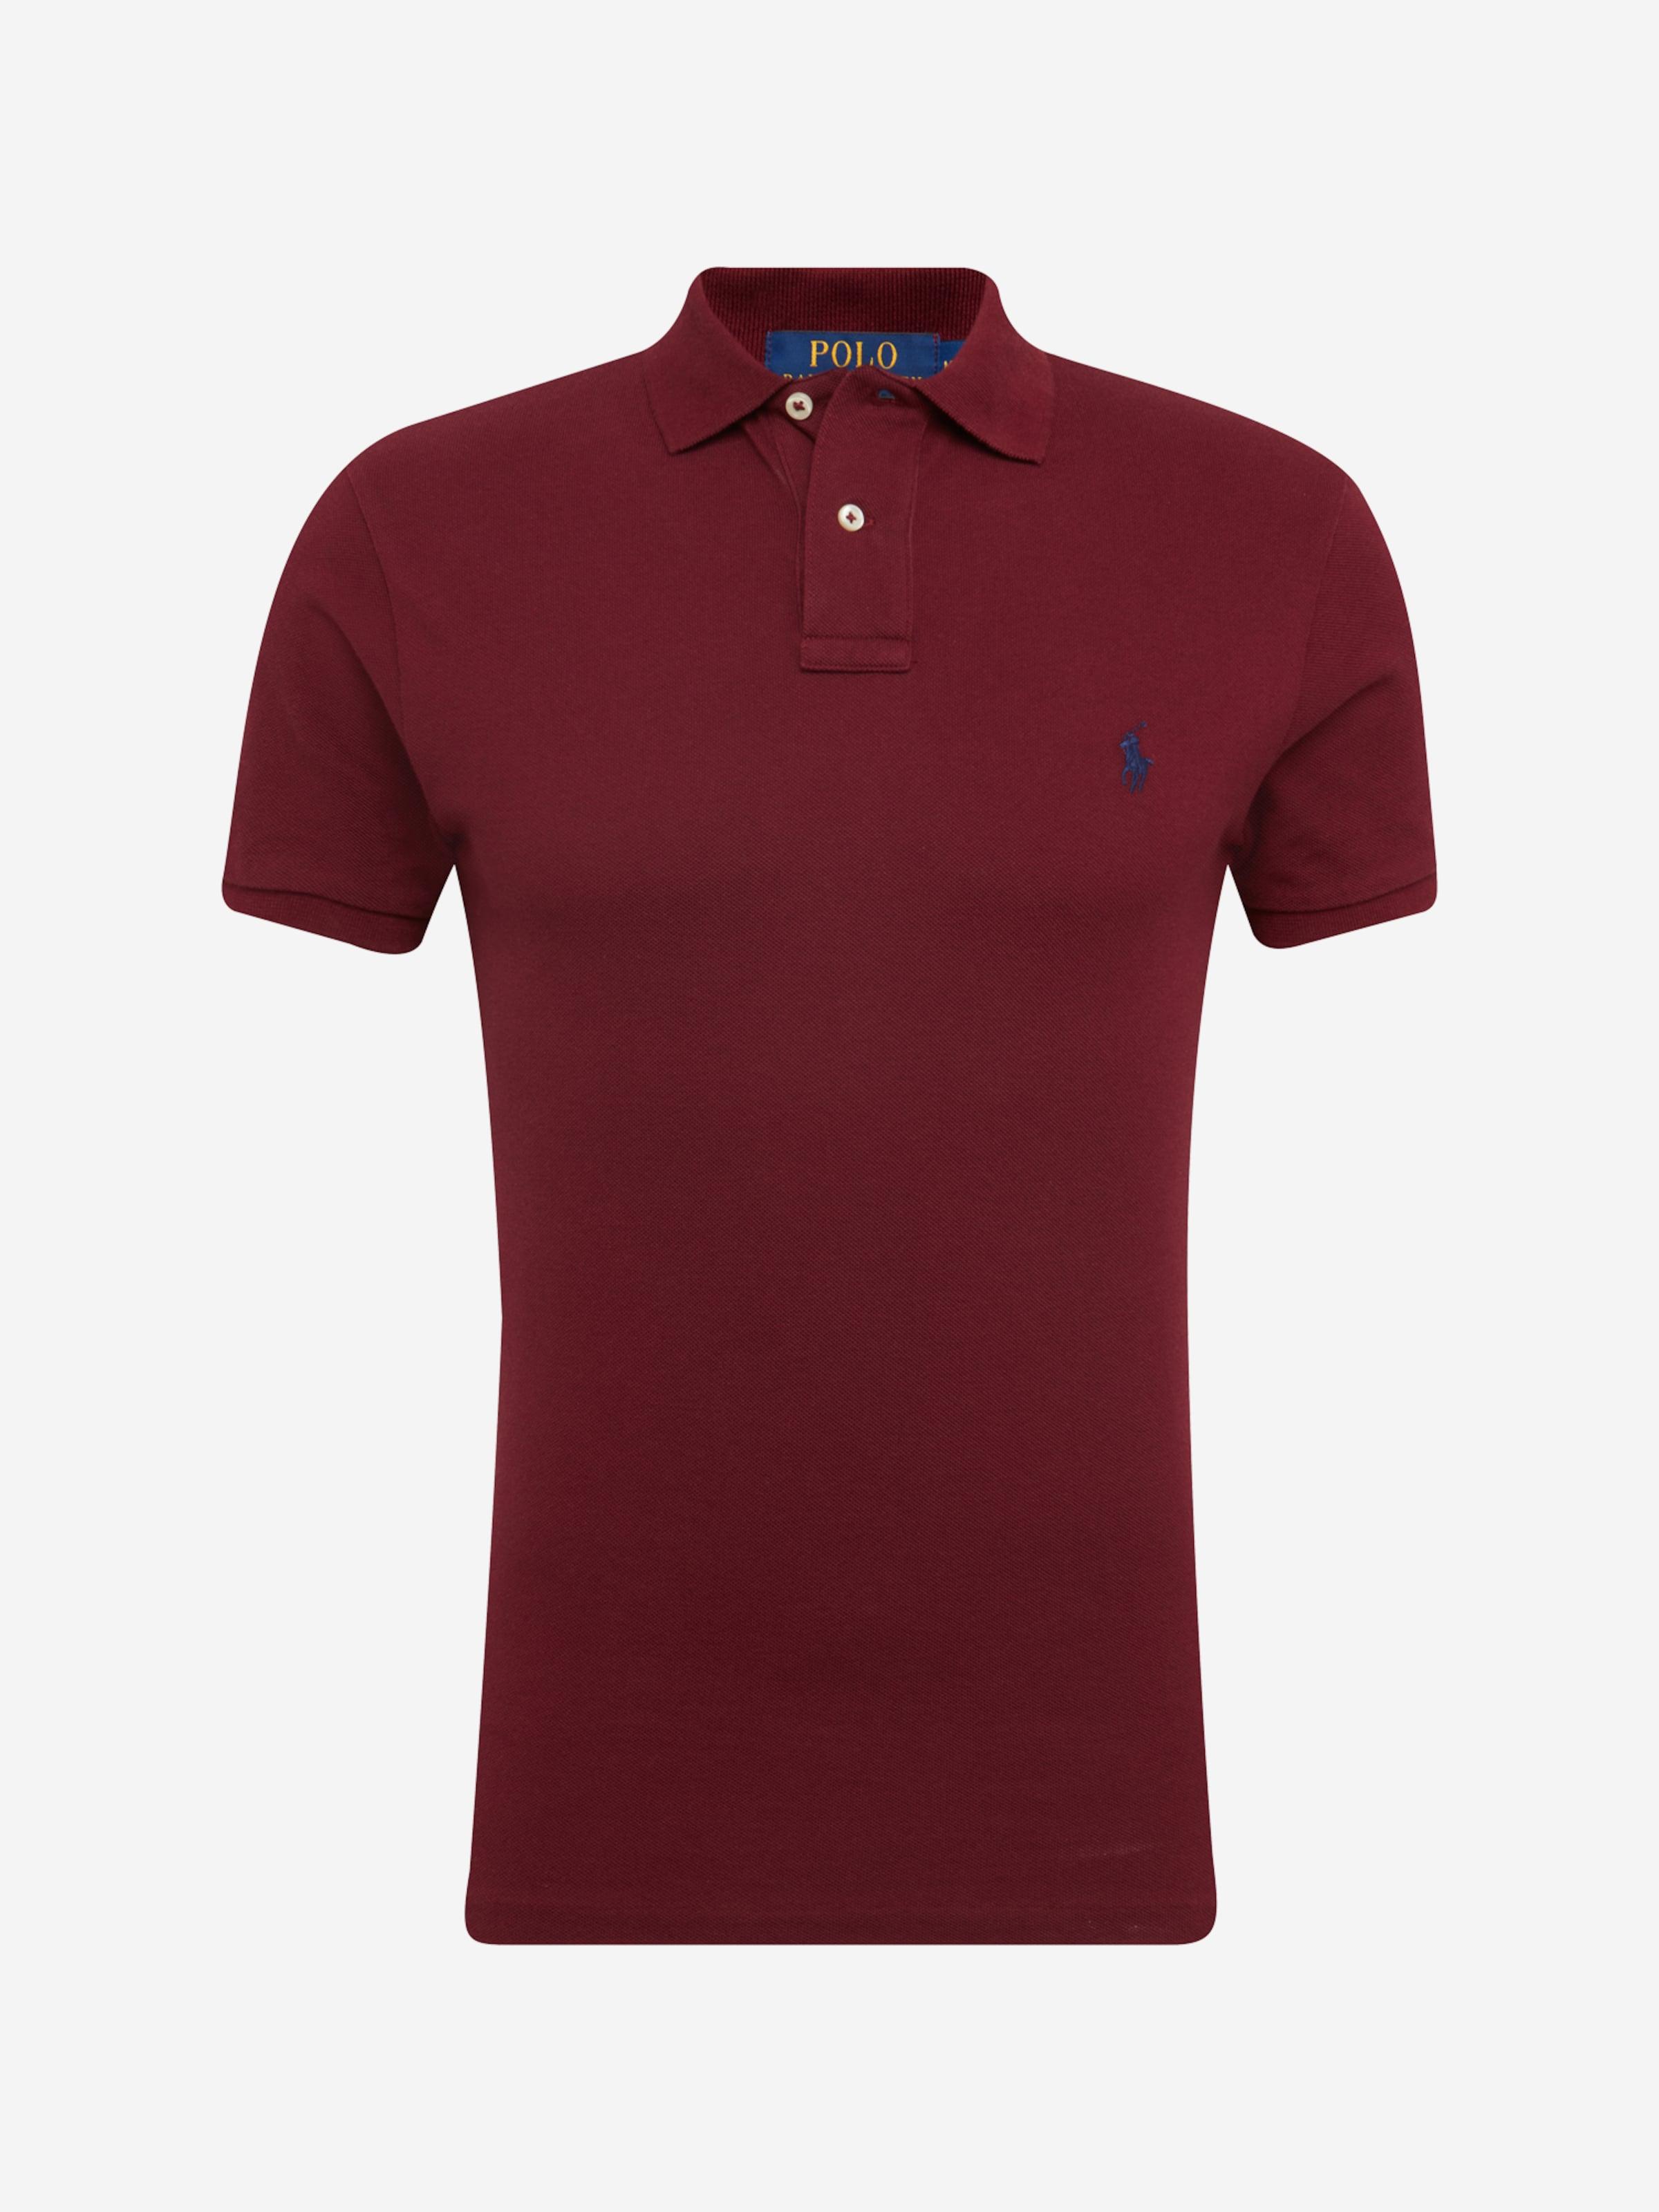 Lie Polo T shirt En Lauren short De knit' Ralph Vin 'sskcslm1 Sleeve xBshtQrdCo